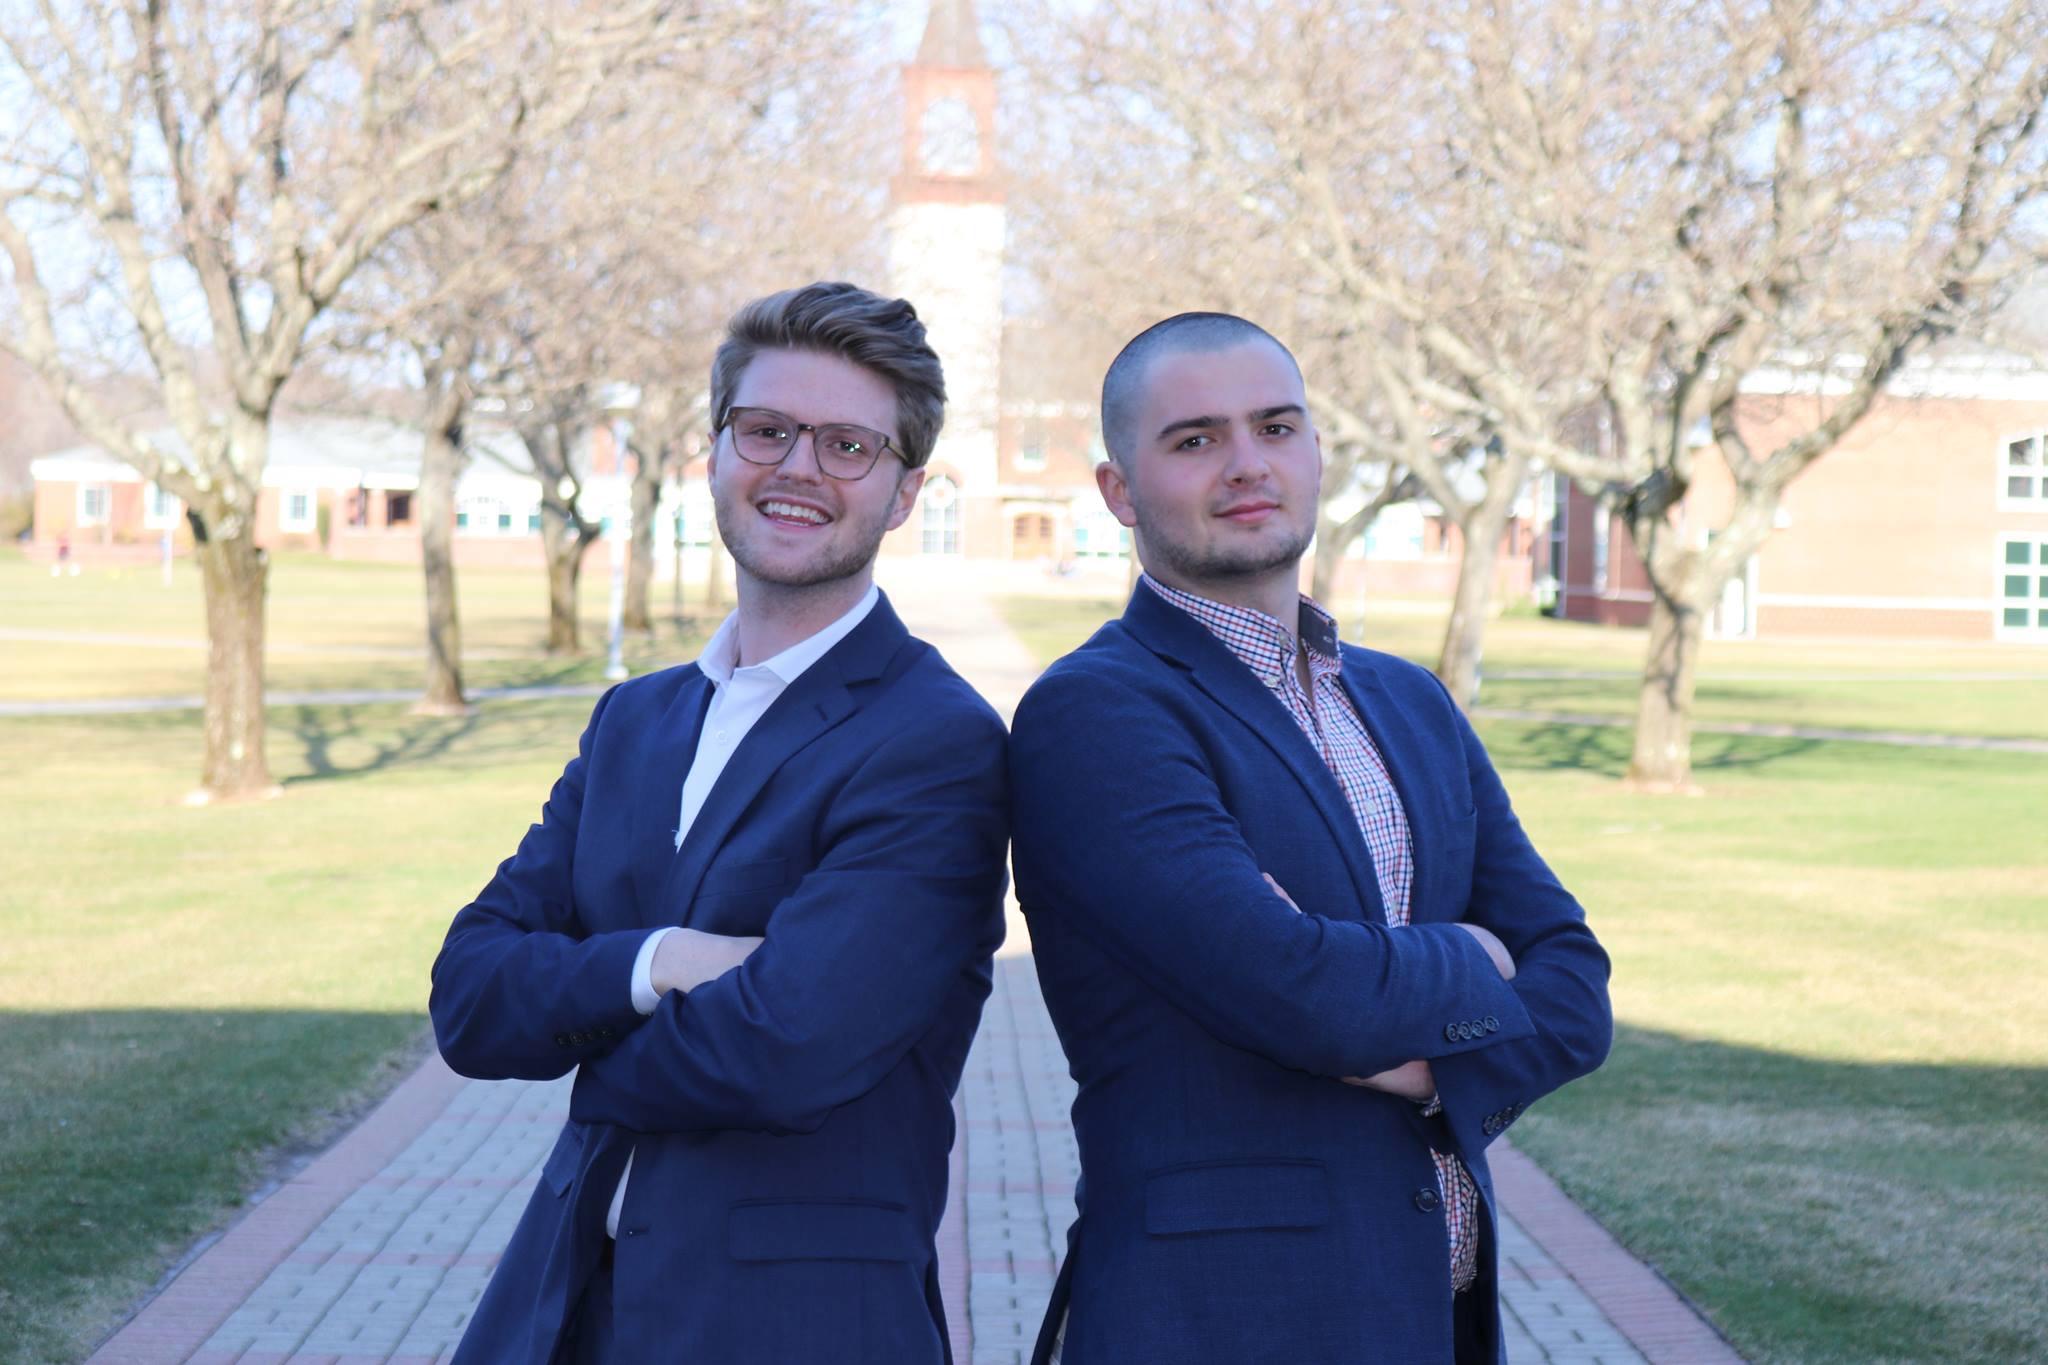 Austin Calvo, President Elect and Luke Ahearn, Class of 2020 Senator